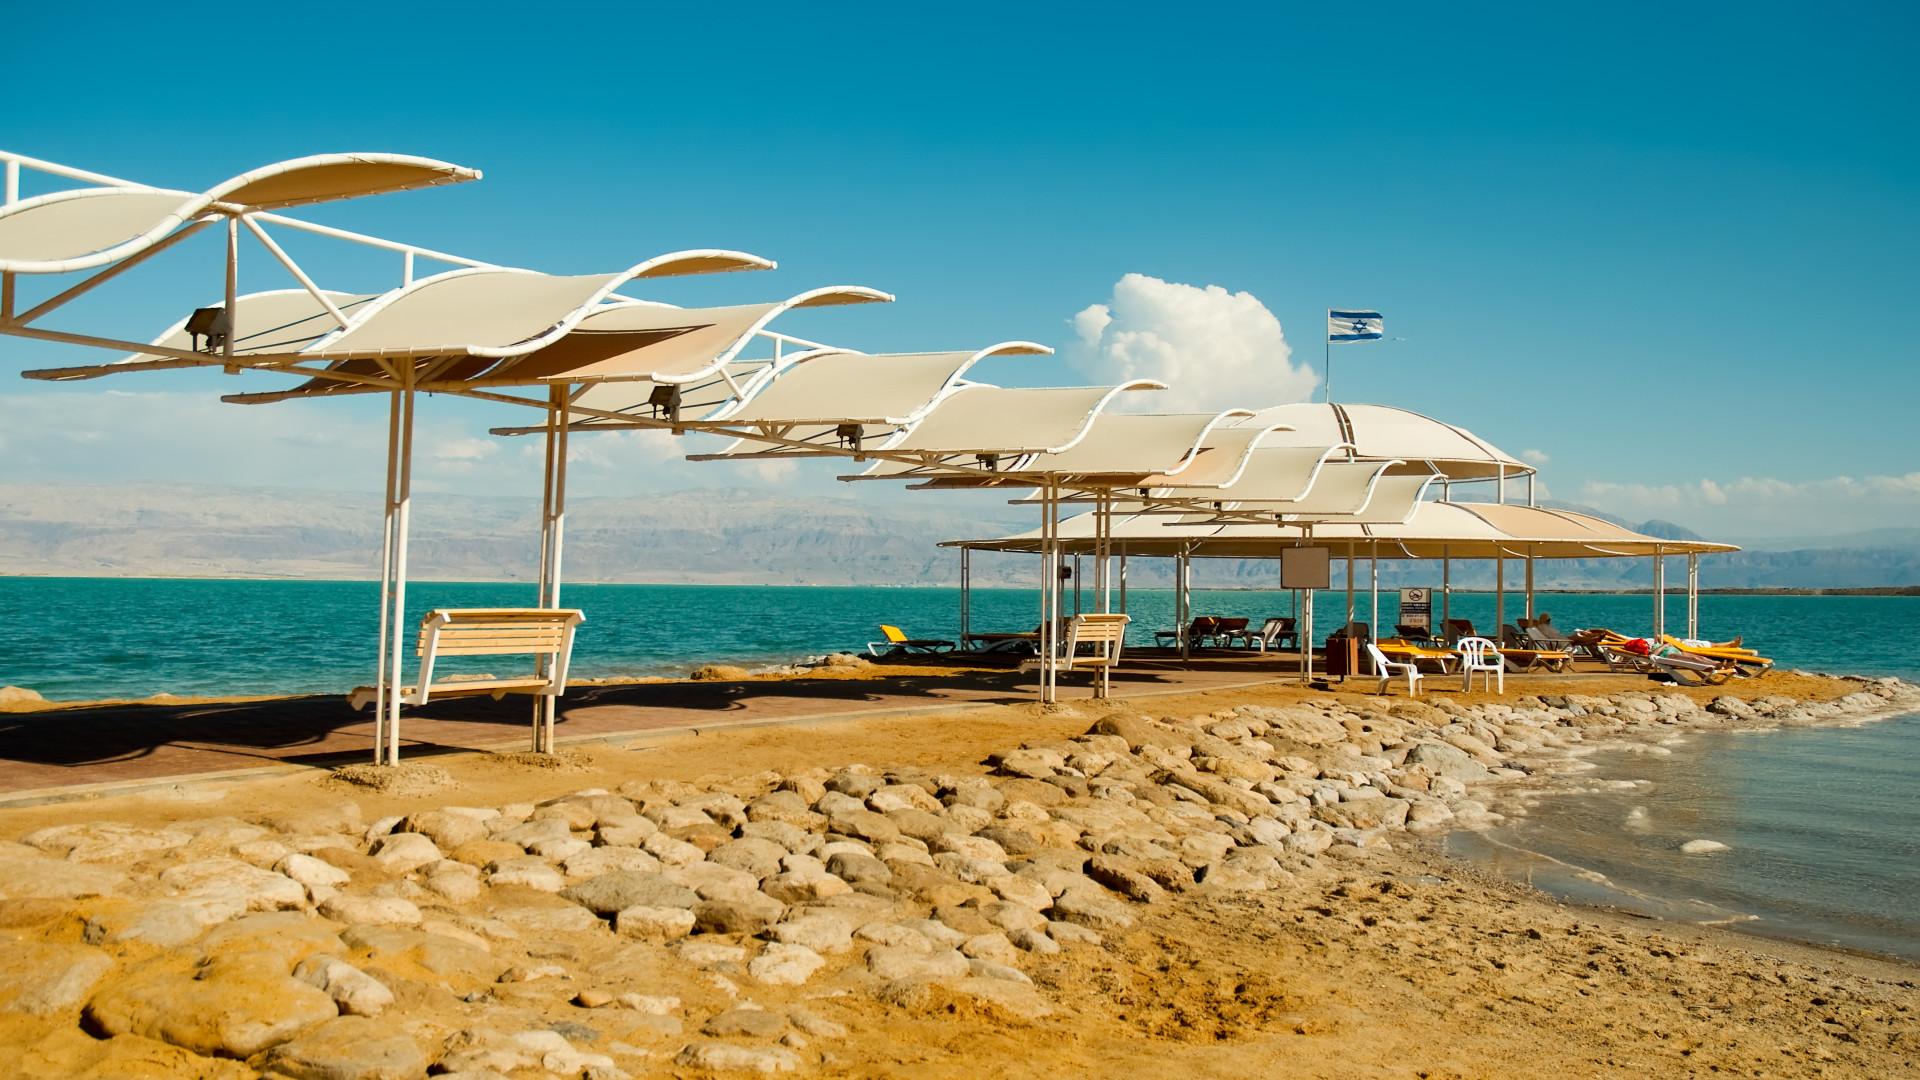 Strand bij Dode Zee, Israël